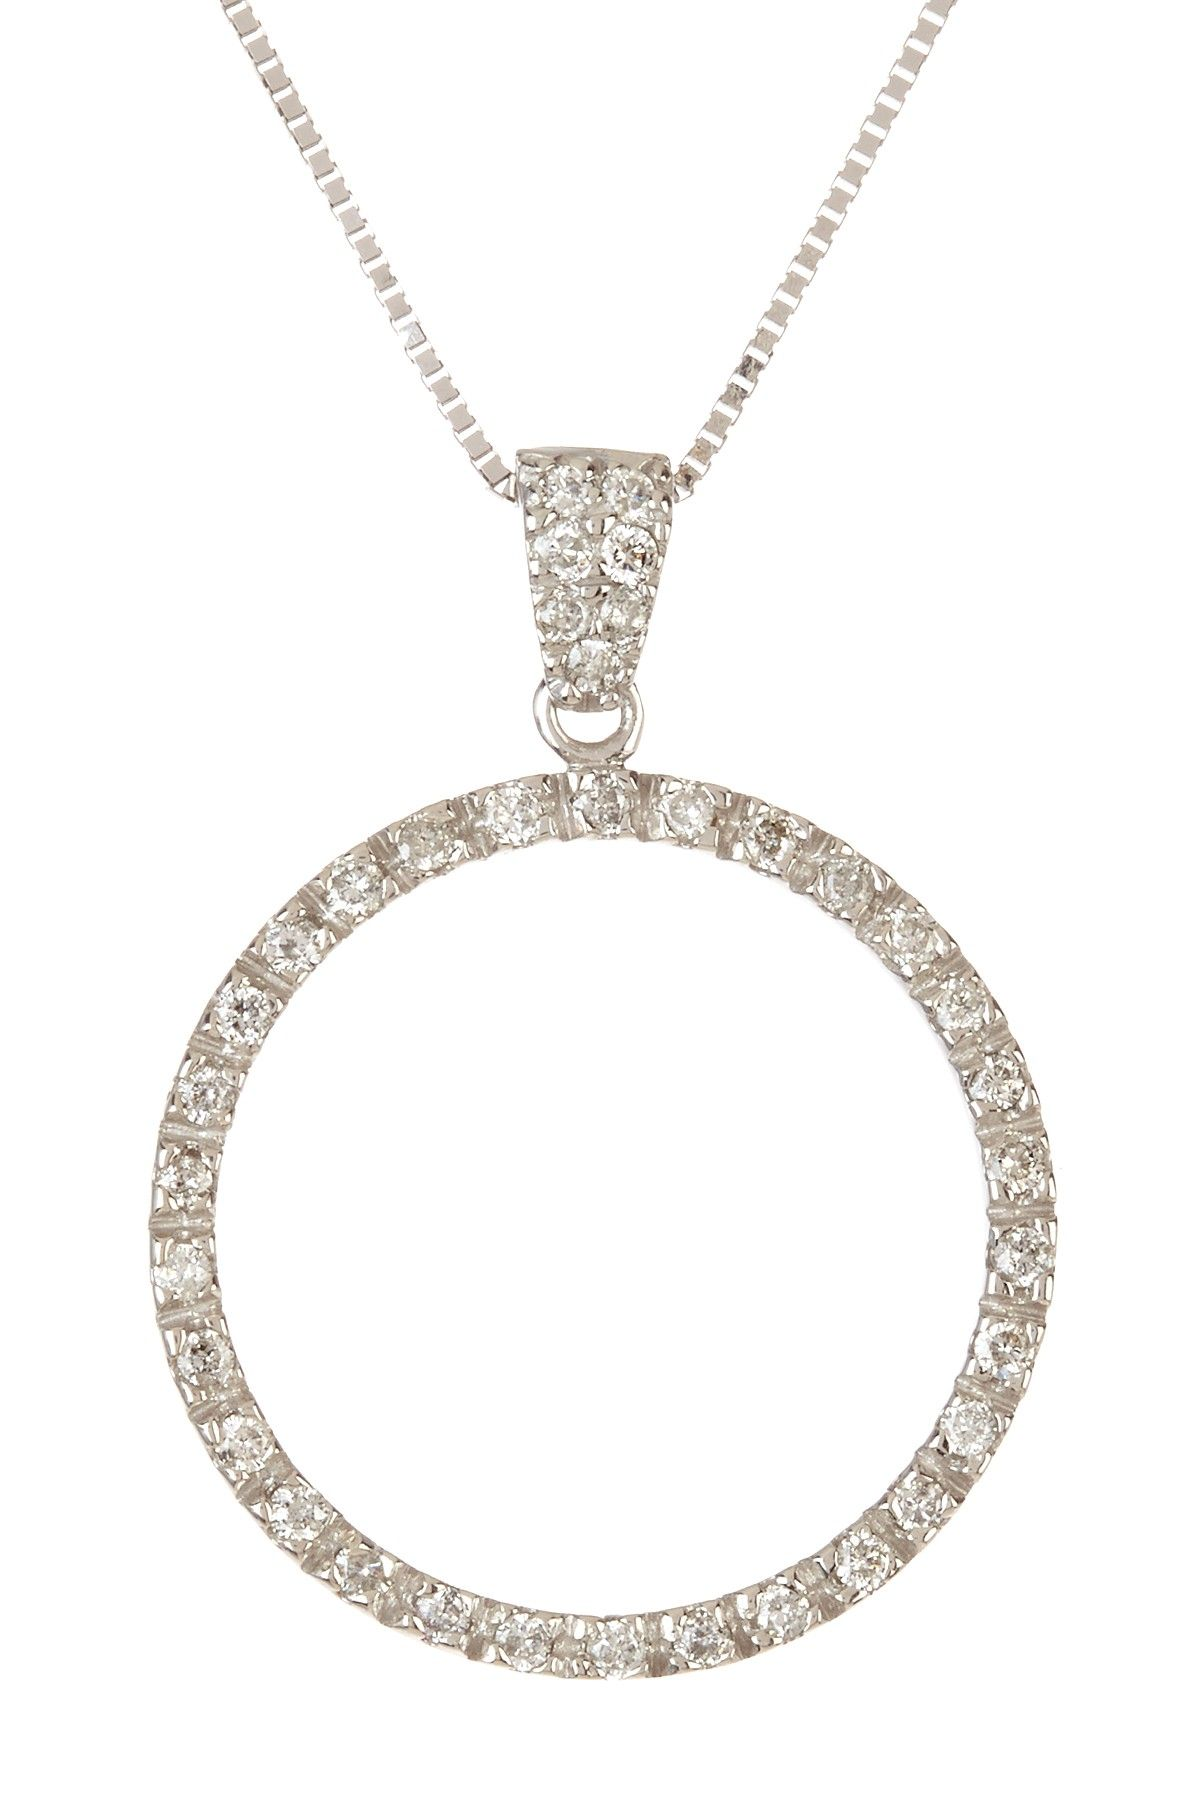 14k white gold diamond circle pendant necklace jewelry pinterest 14k white gold diamond circle pendant necklace aloadofball Choice Image